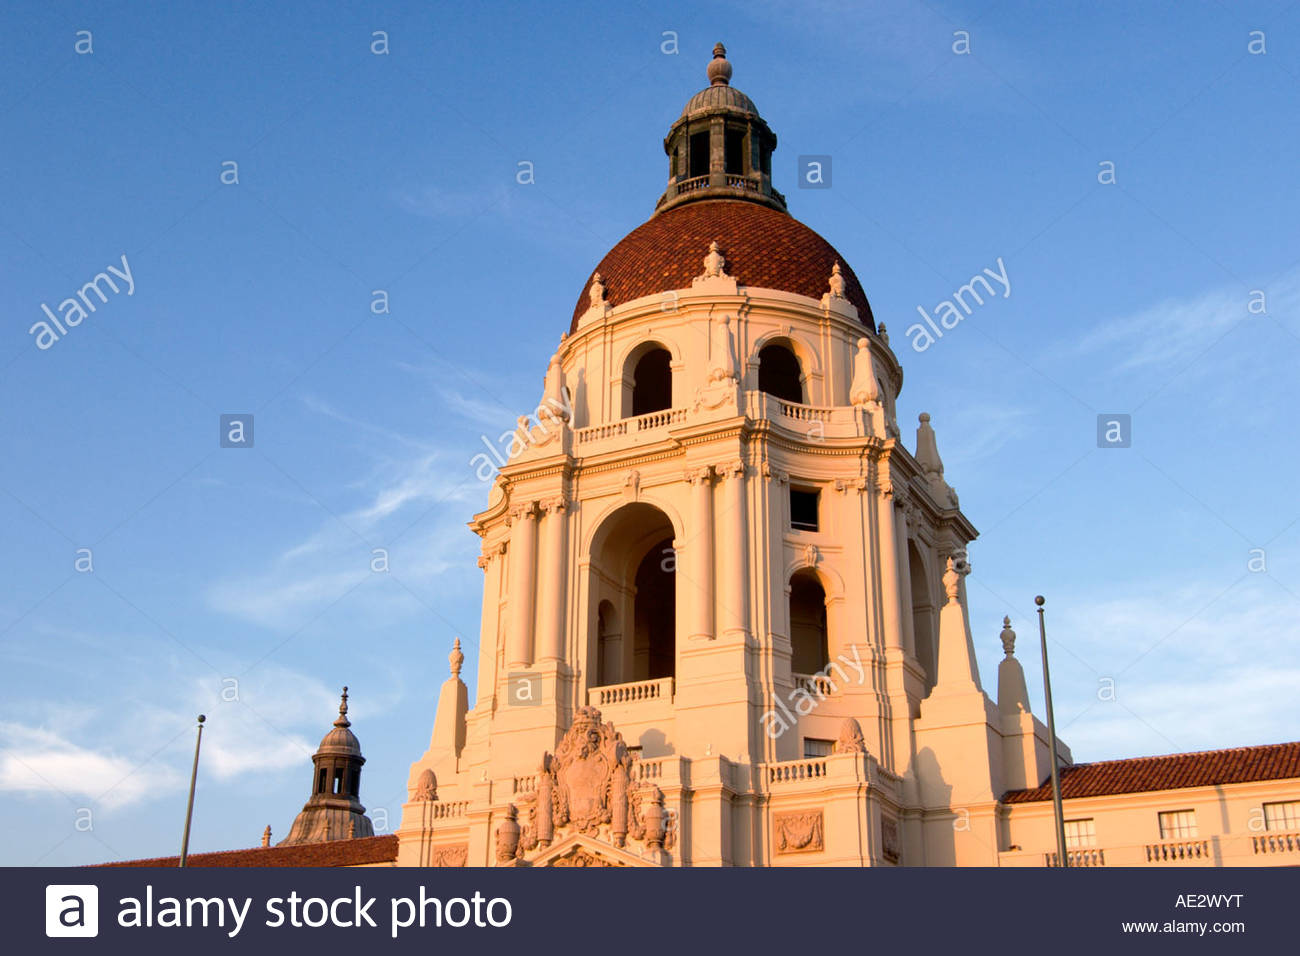 pasadena city hall baroque italian renaissance architecture style